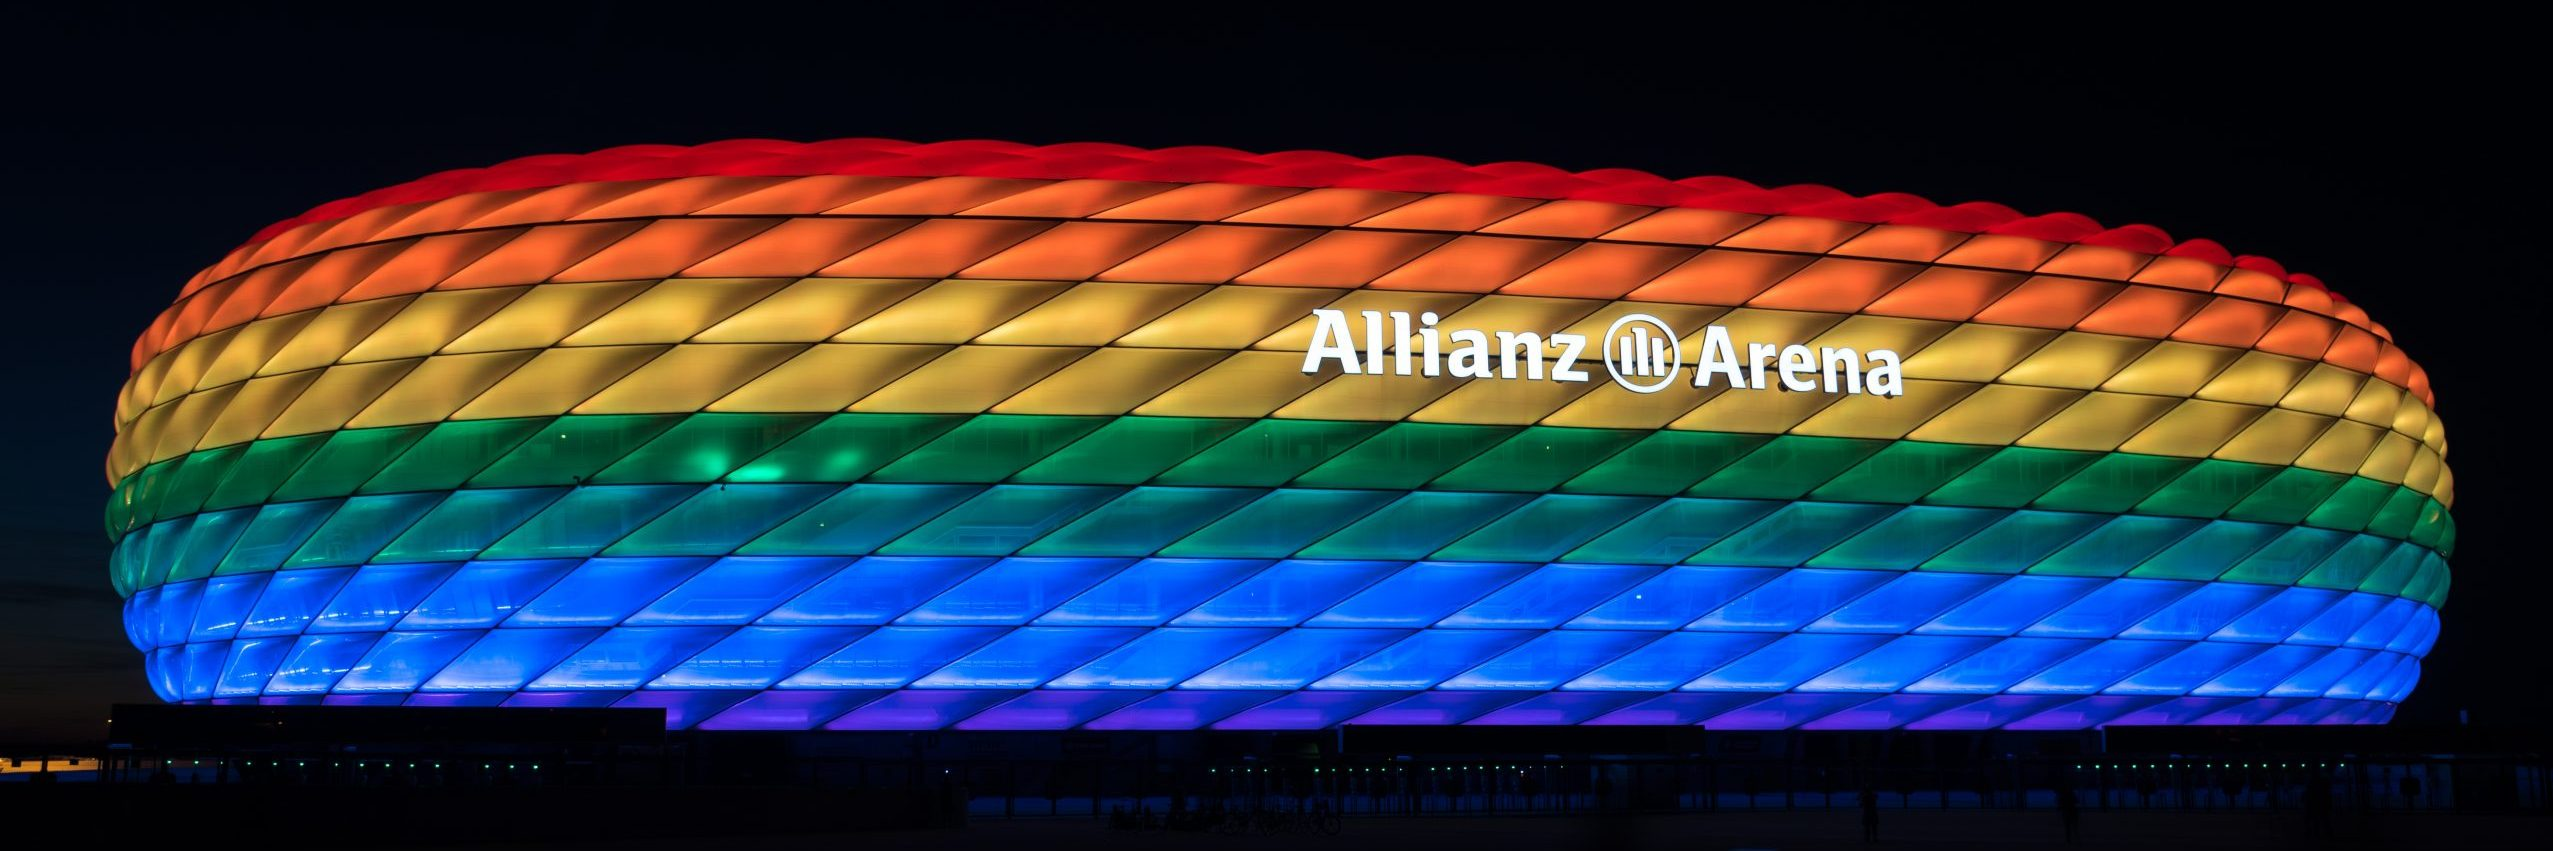 angestrahlte Allianz-Arena in Regenbogenfarben